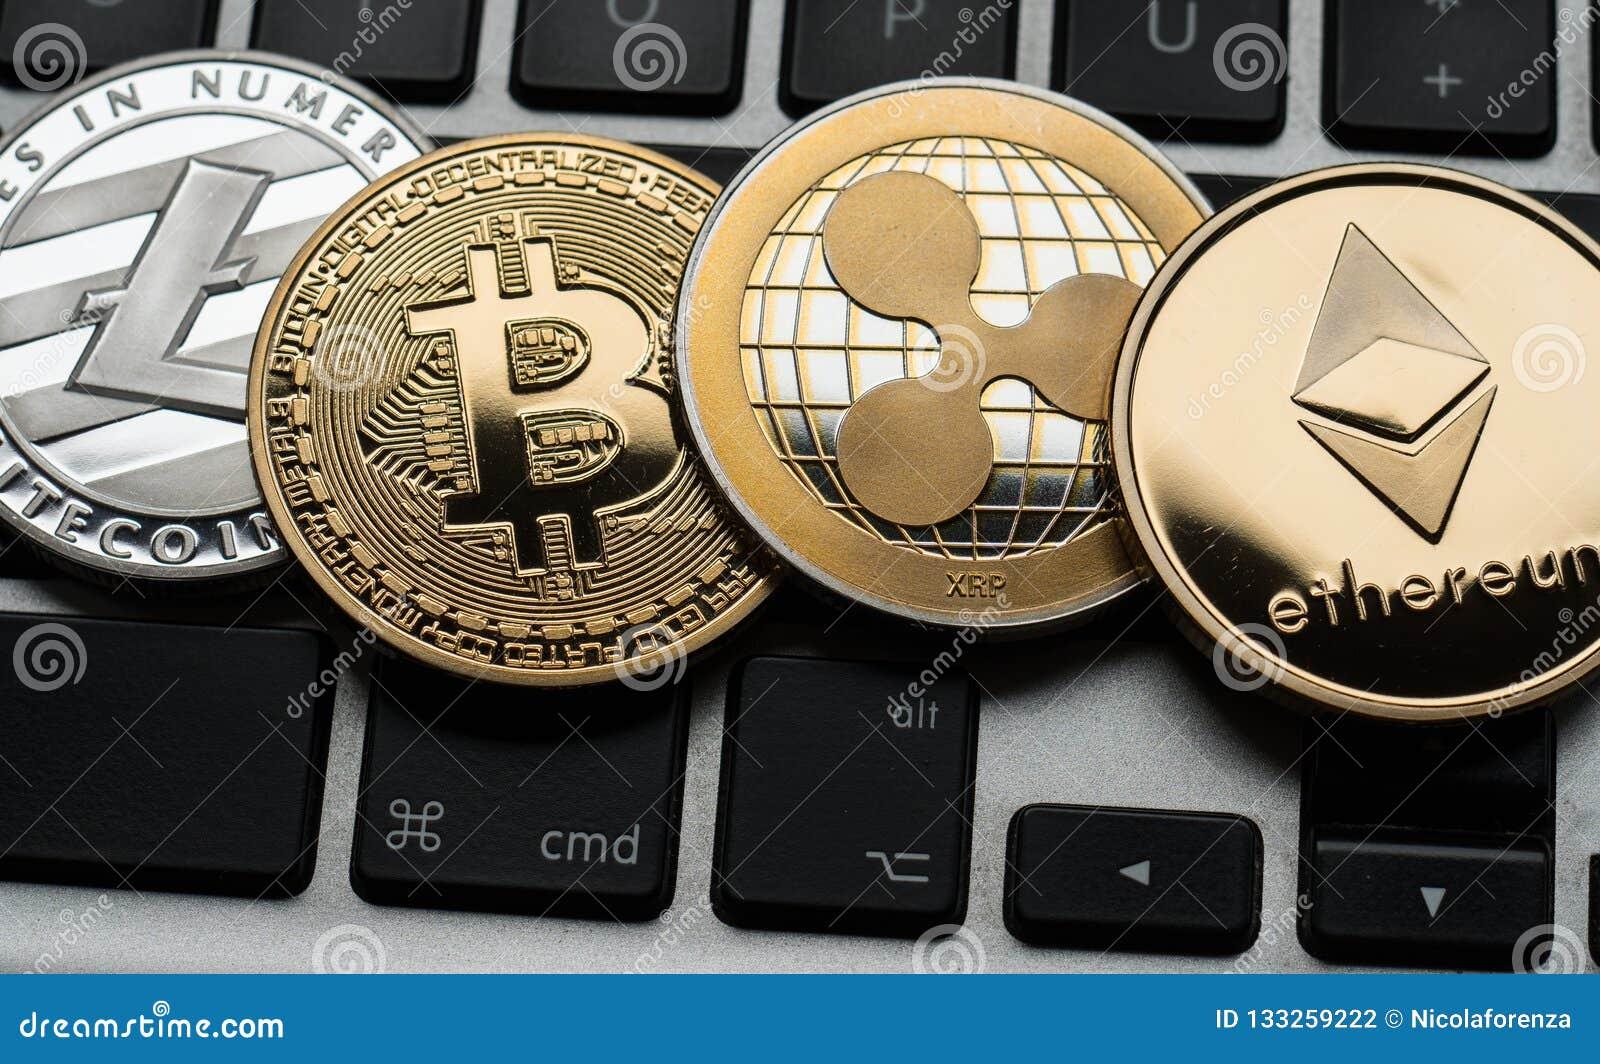 Монетки Cryptocurrencies Ethereum, пульсации, Bitcoin и Litecoin на клавиатуре ноутбука компьютера